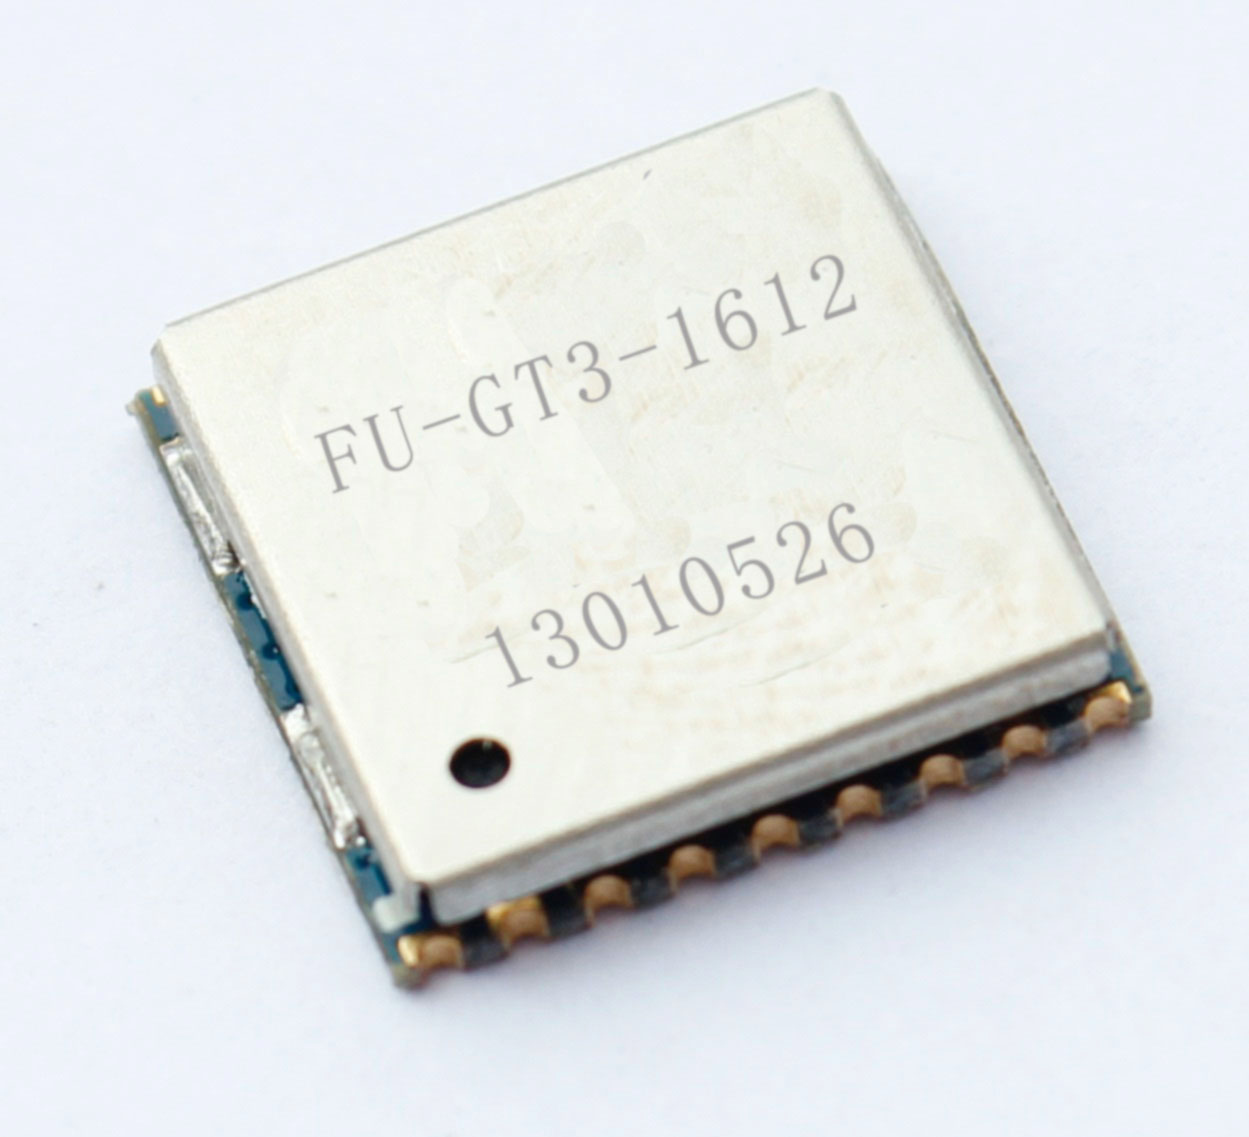 GPS车载导航模组FU-GT3-1612